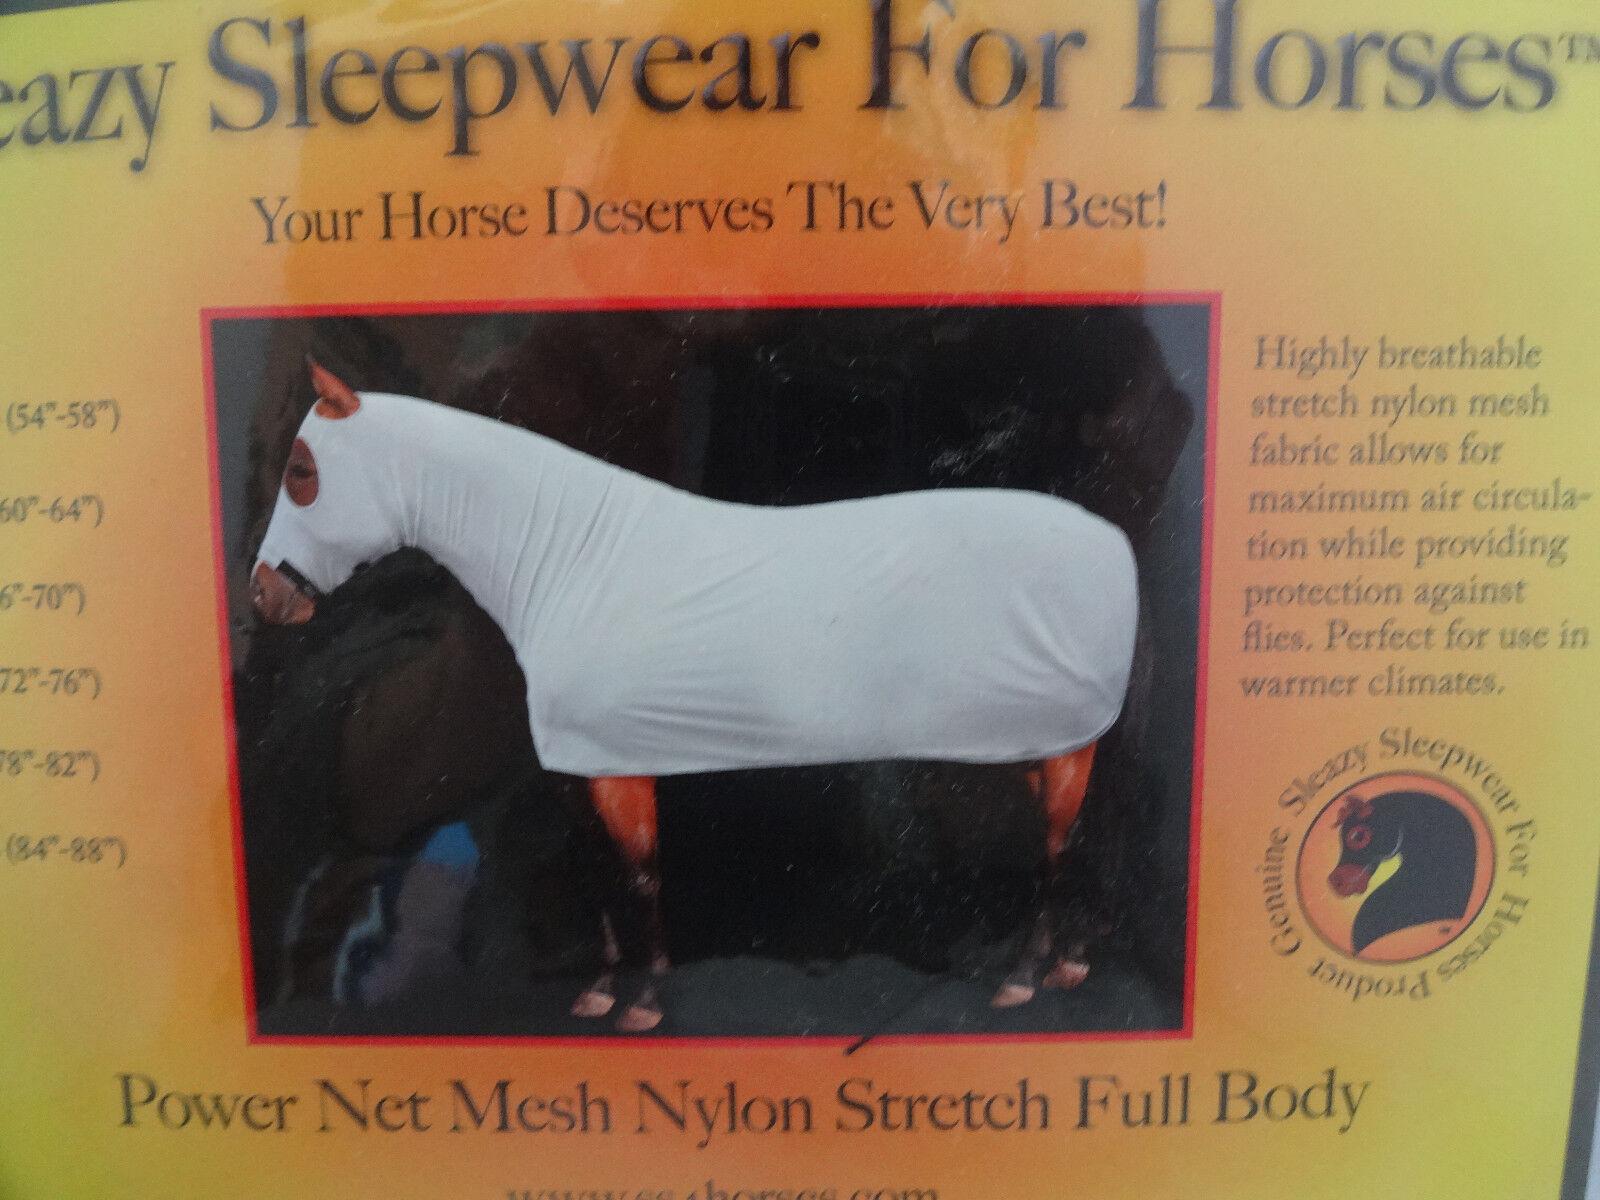 New Sleazy Sleepwear Full Body Horse Zipper Power Net Mesh Fly Nylon Sheet Hood